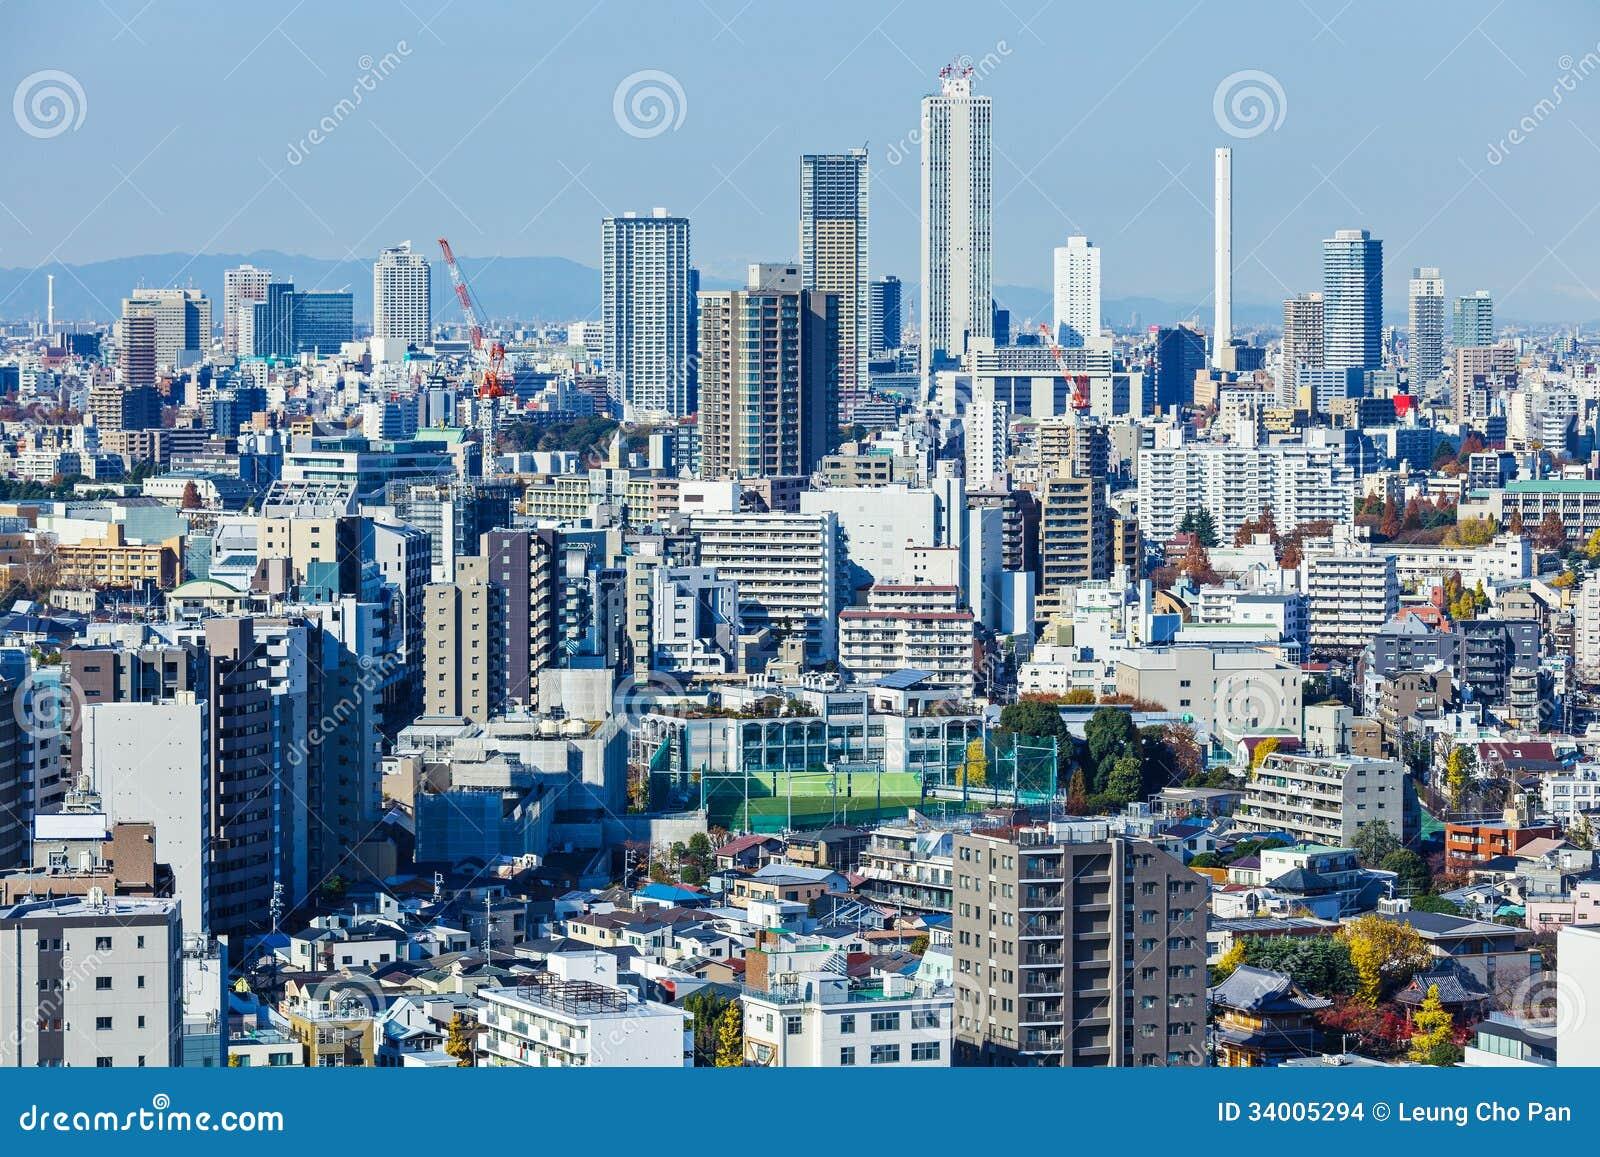 tokyo dark city skyline - photo #9